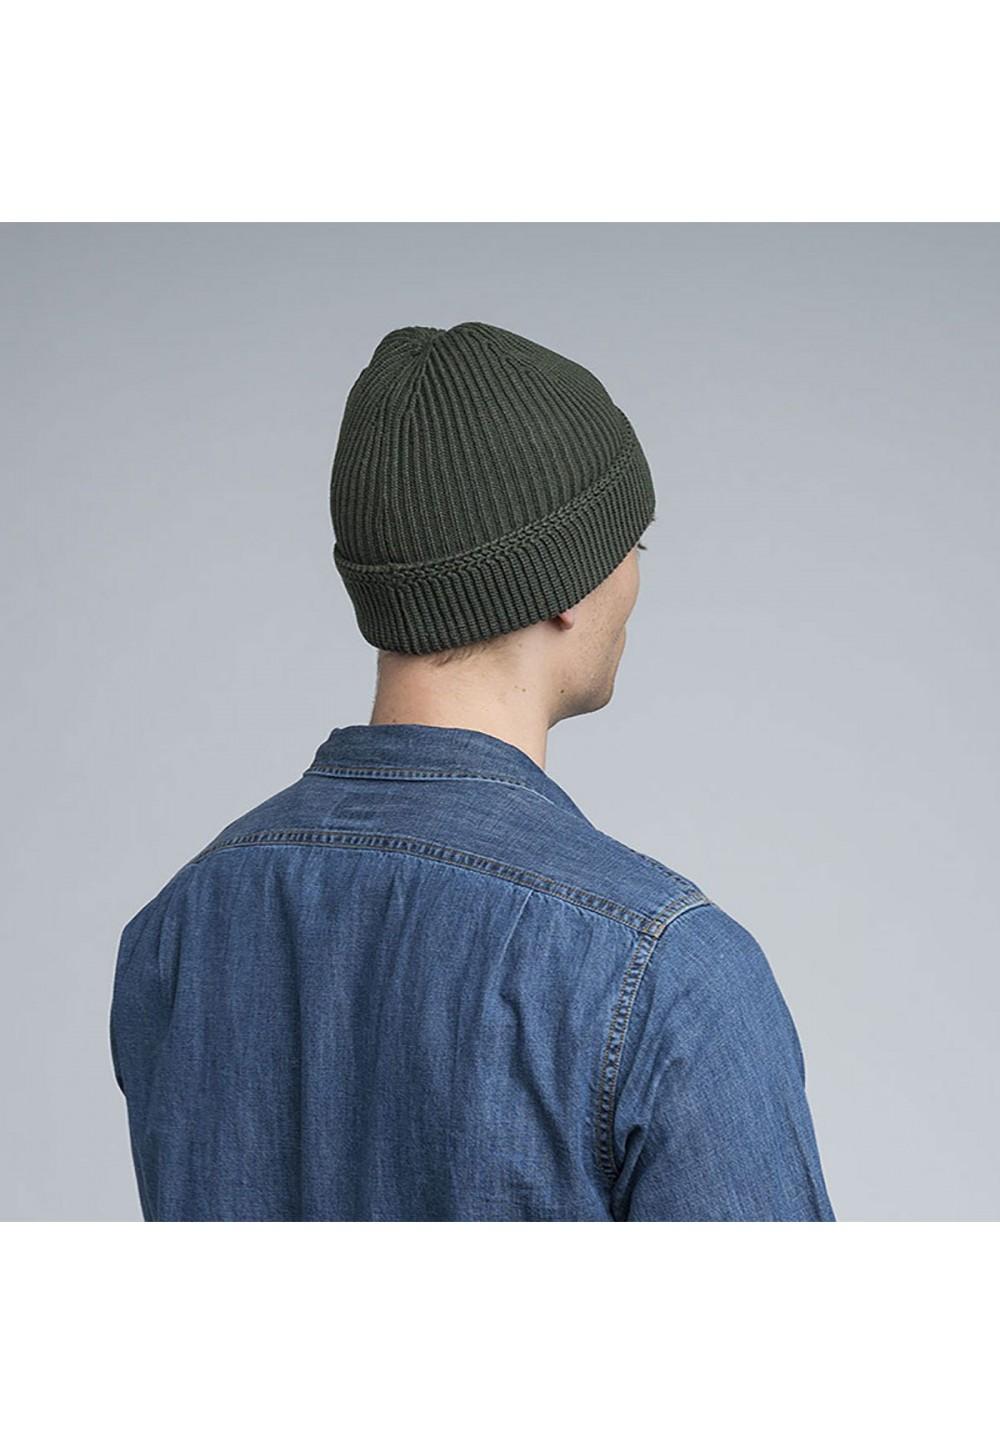 Акуратна стильна шапка з манжетом